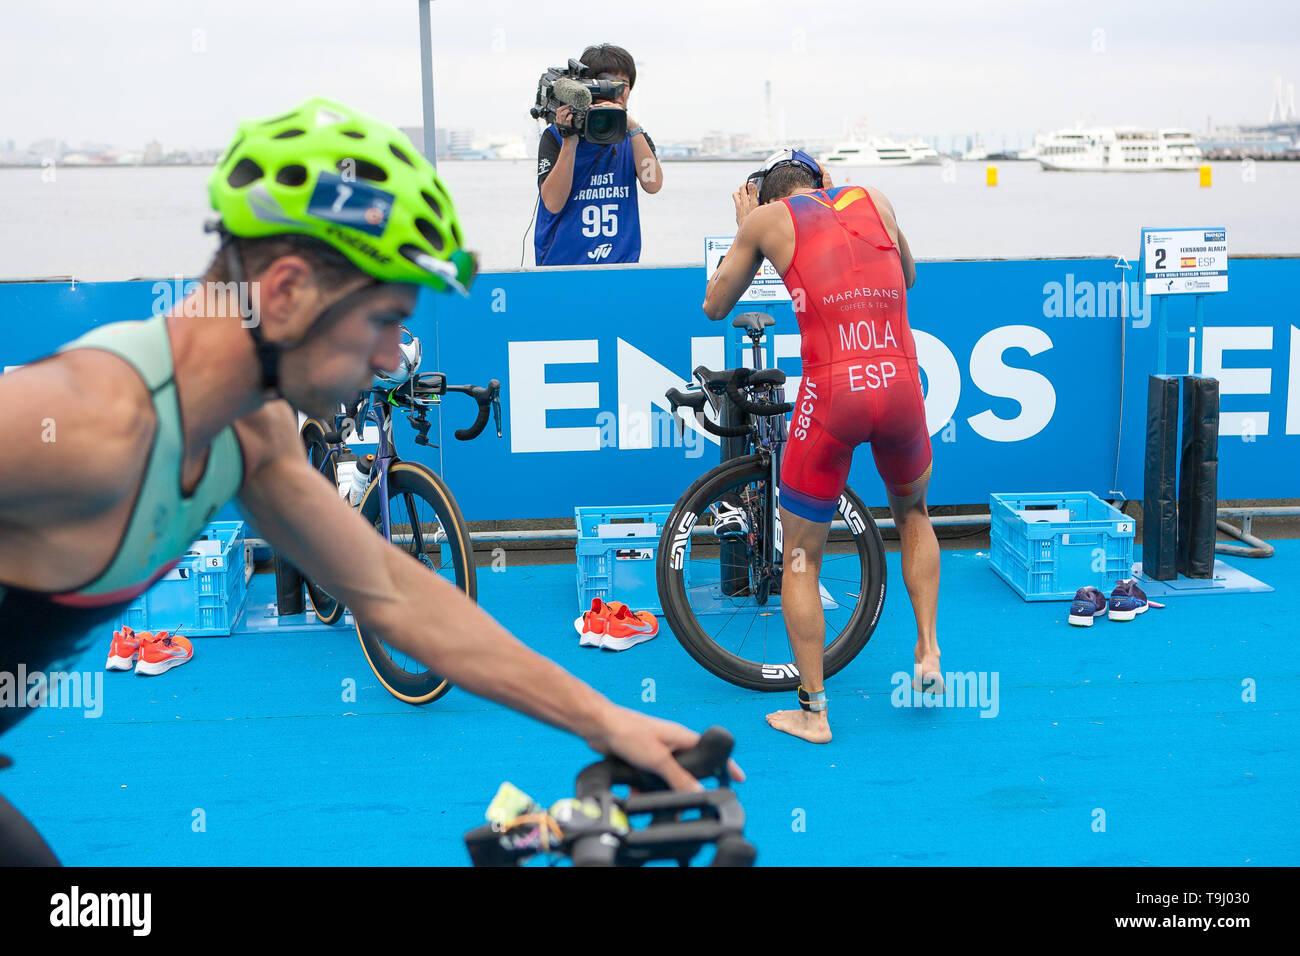 Yokohama, Japan. 18th May, 2019. 2019 ITU World Triathlon, World Paratriathlon Yokohama at Yamashita Park and Minato Mirai, Yokohama. Mola (Photos by Michael Steinebach/AFLO) Credit: Aflo Co. Ltd./Alamy Live News Stock Photo